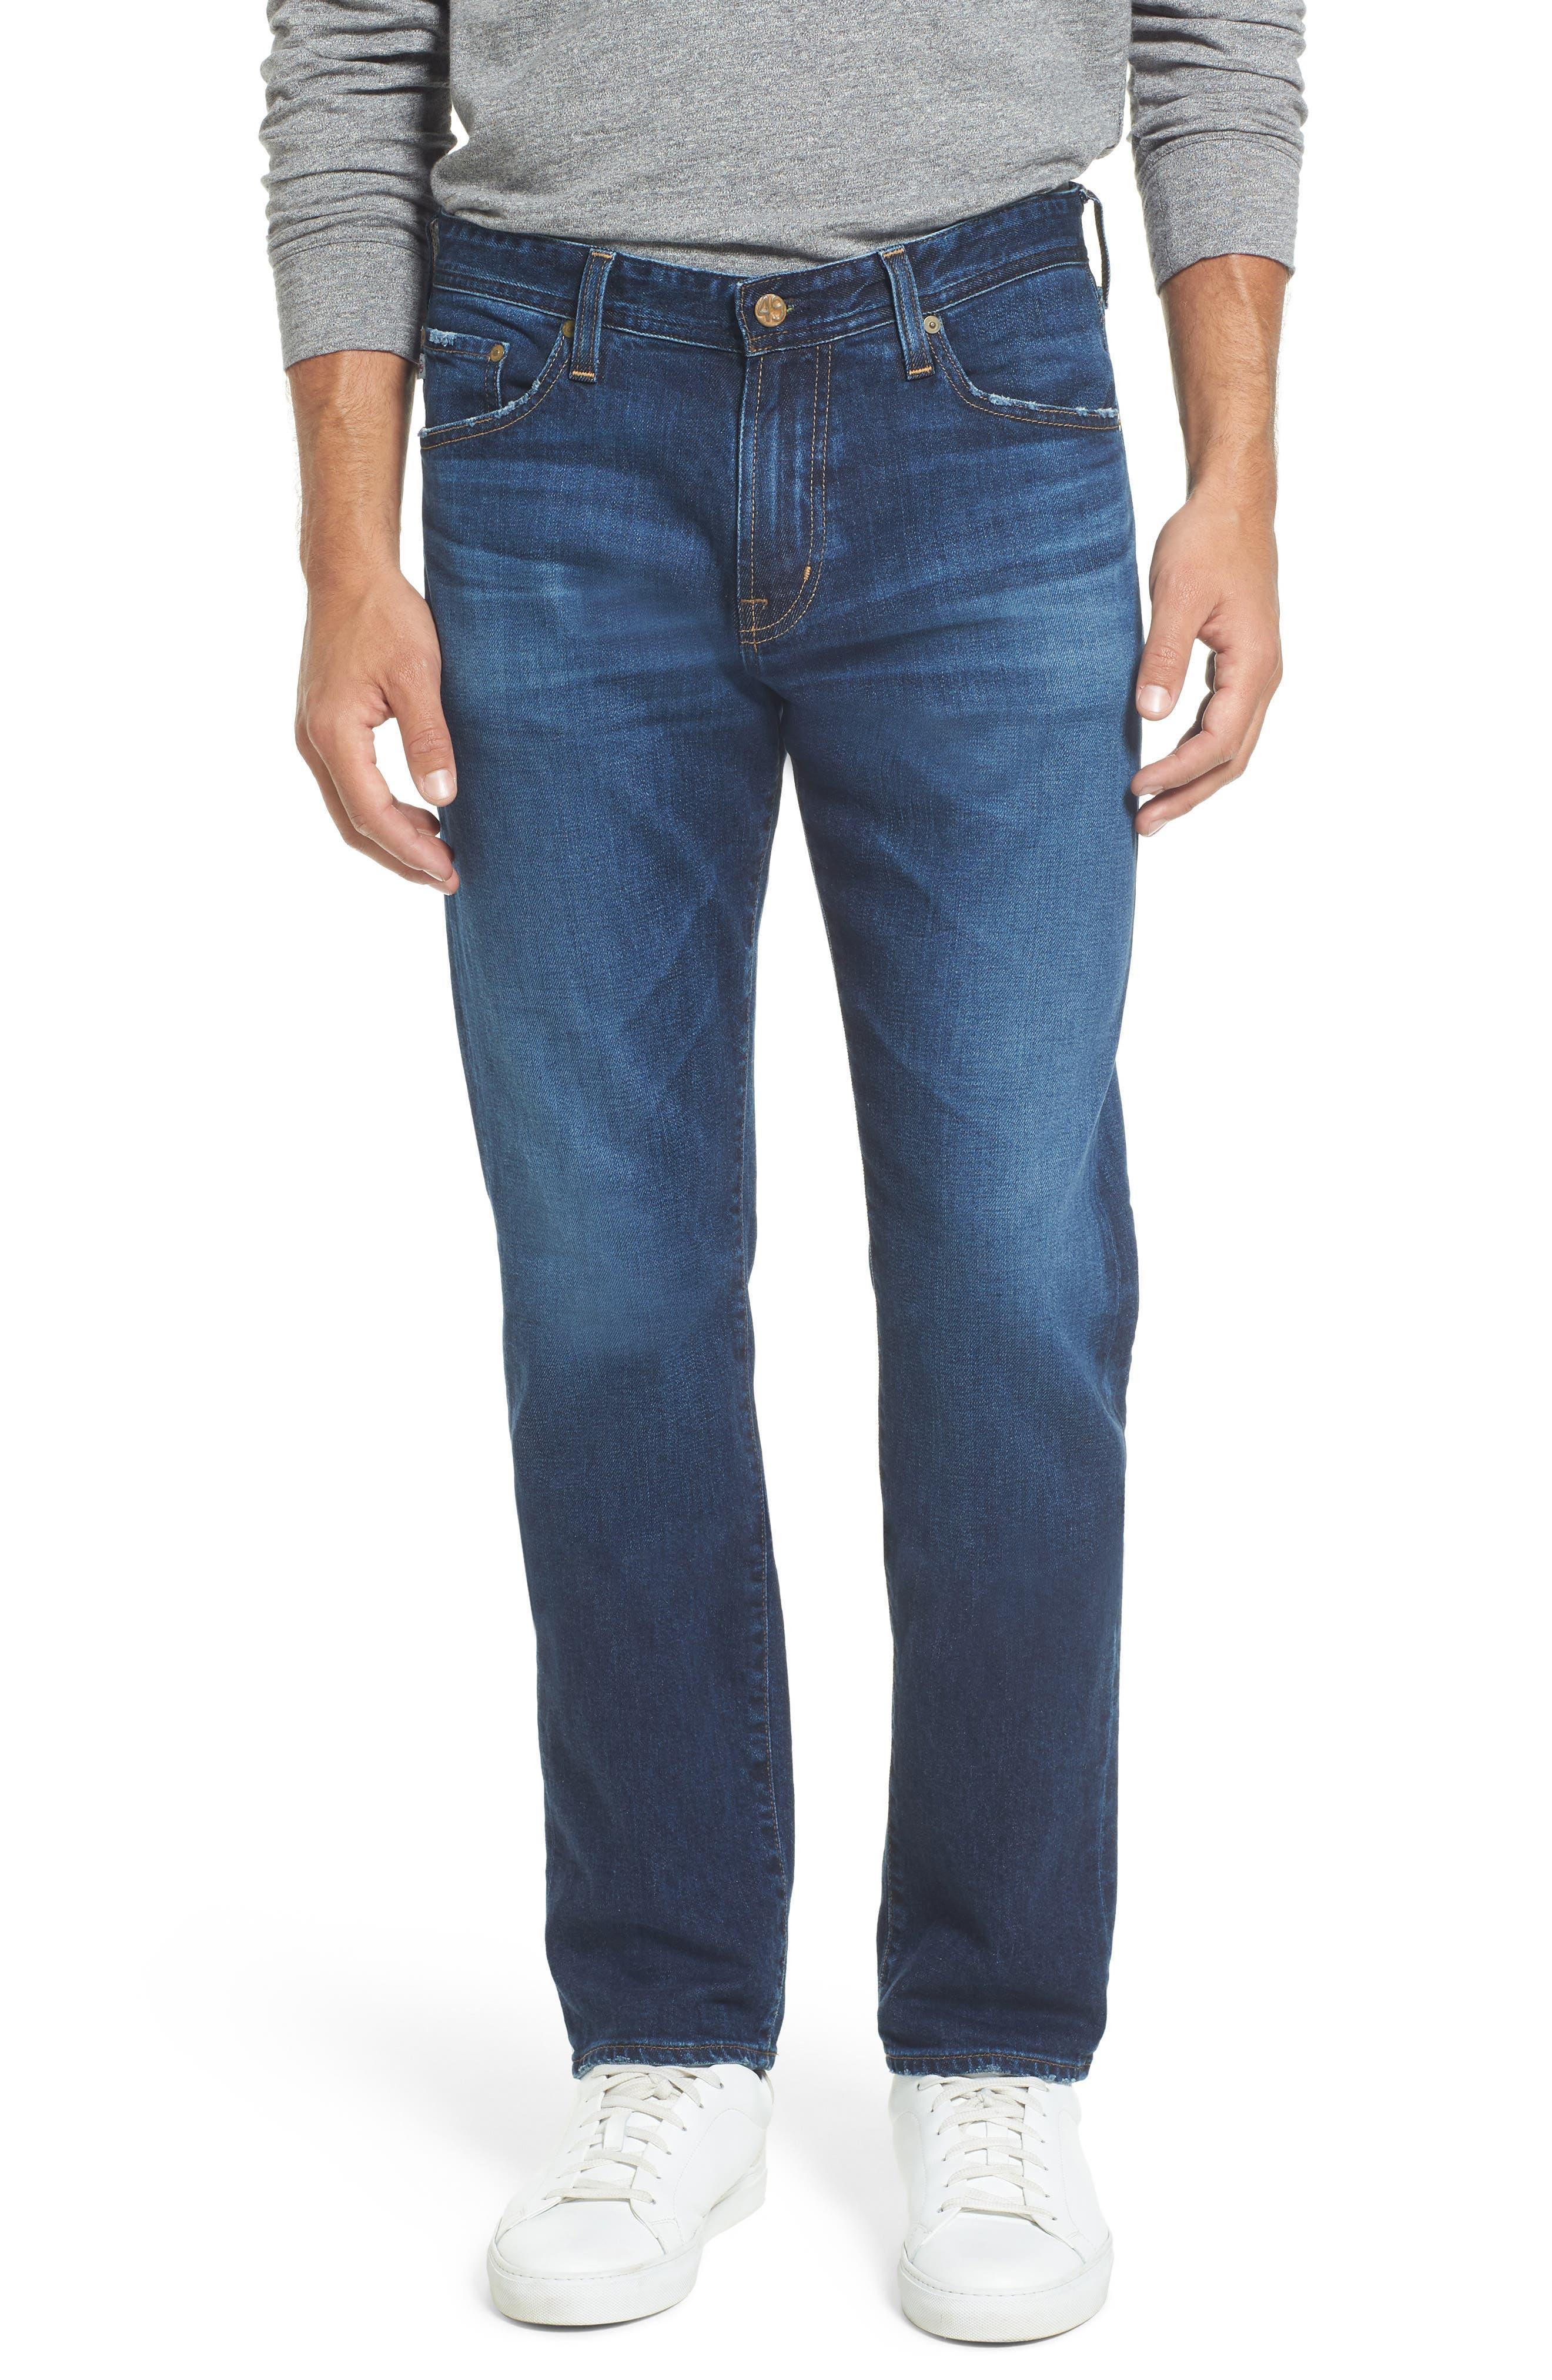 Graduate Slim Straight Leg Jeans,                         Main,                         color, 9 Years Aflame